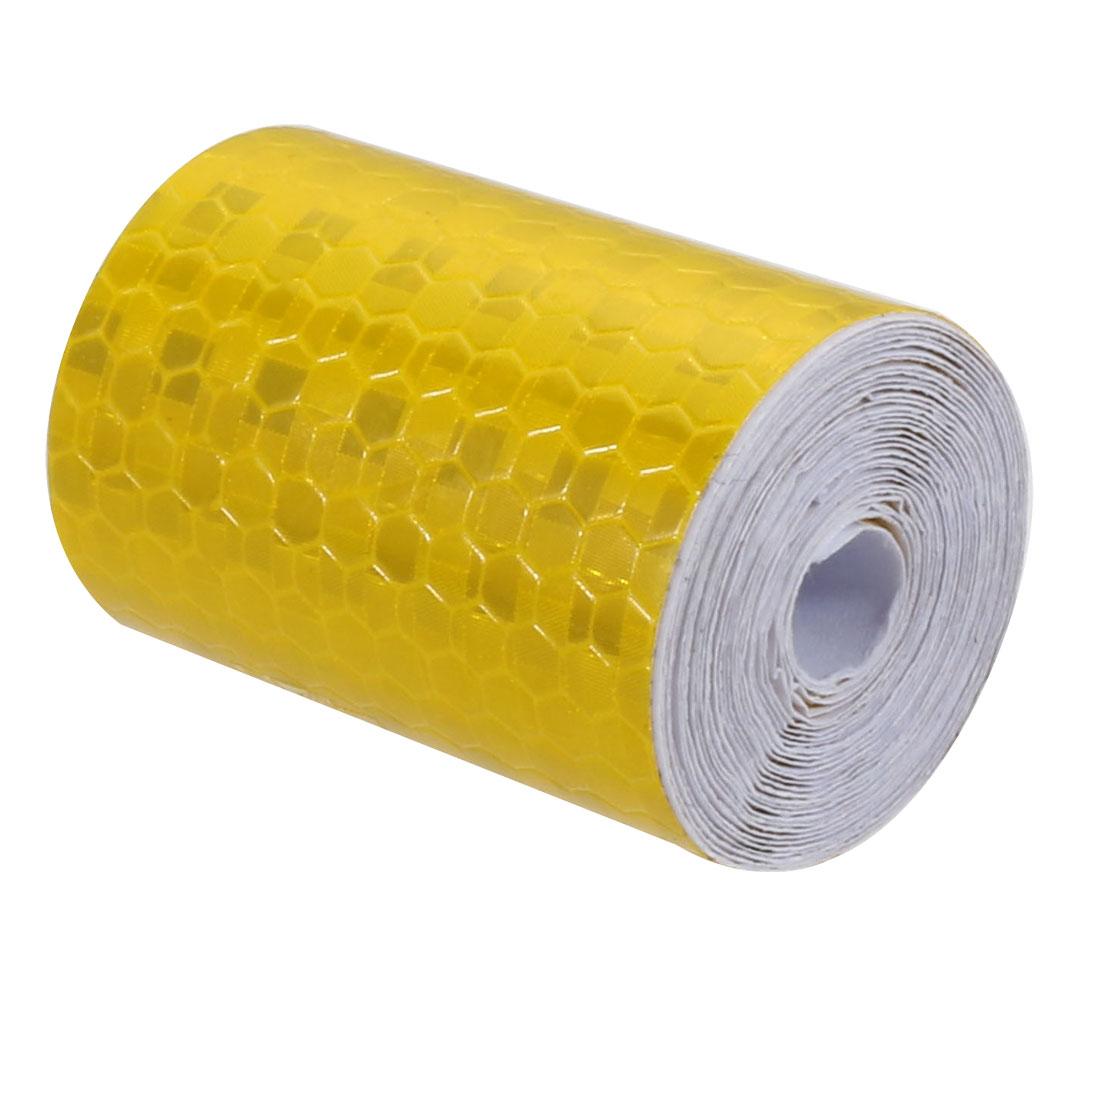 5cm Width 2M Length Honeycomb Adhesive Reflective Warning Tape Yellow